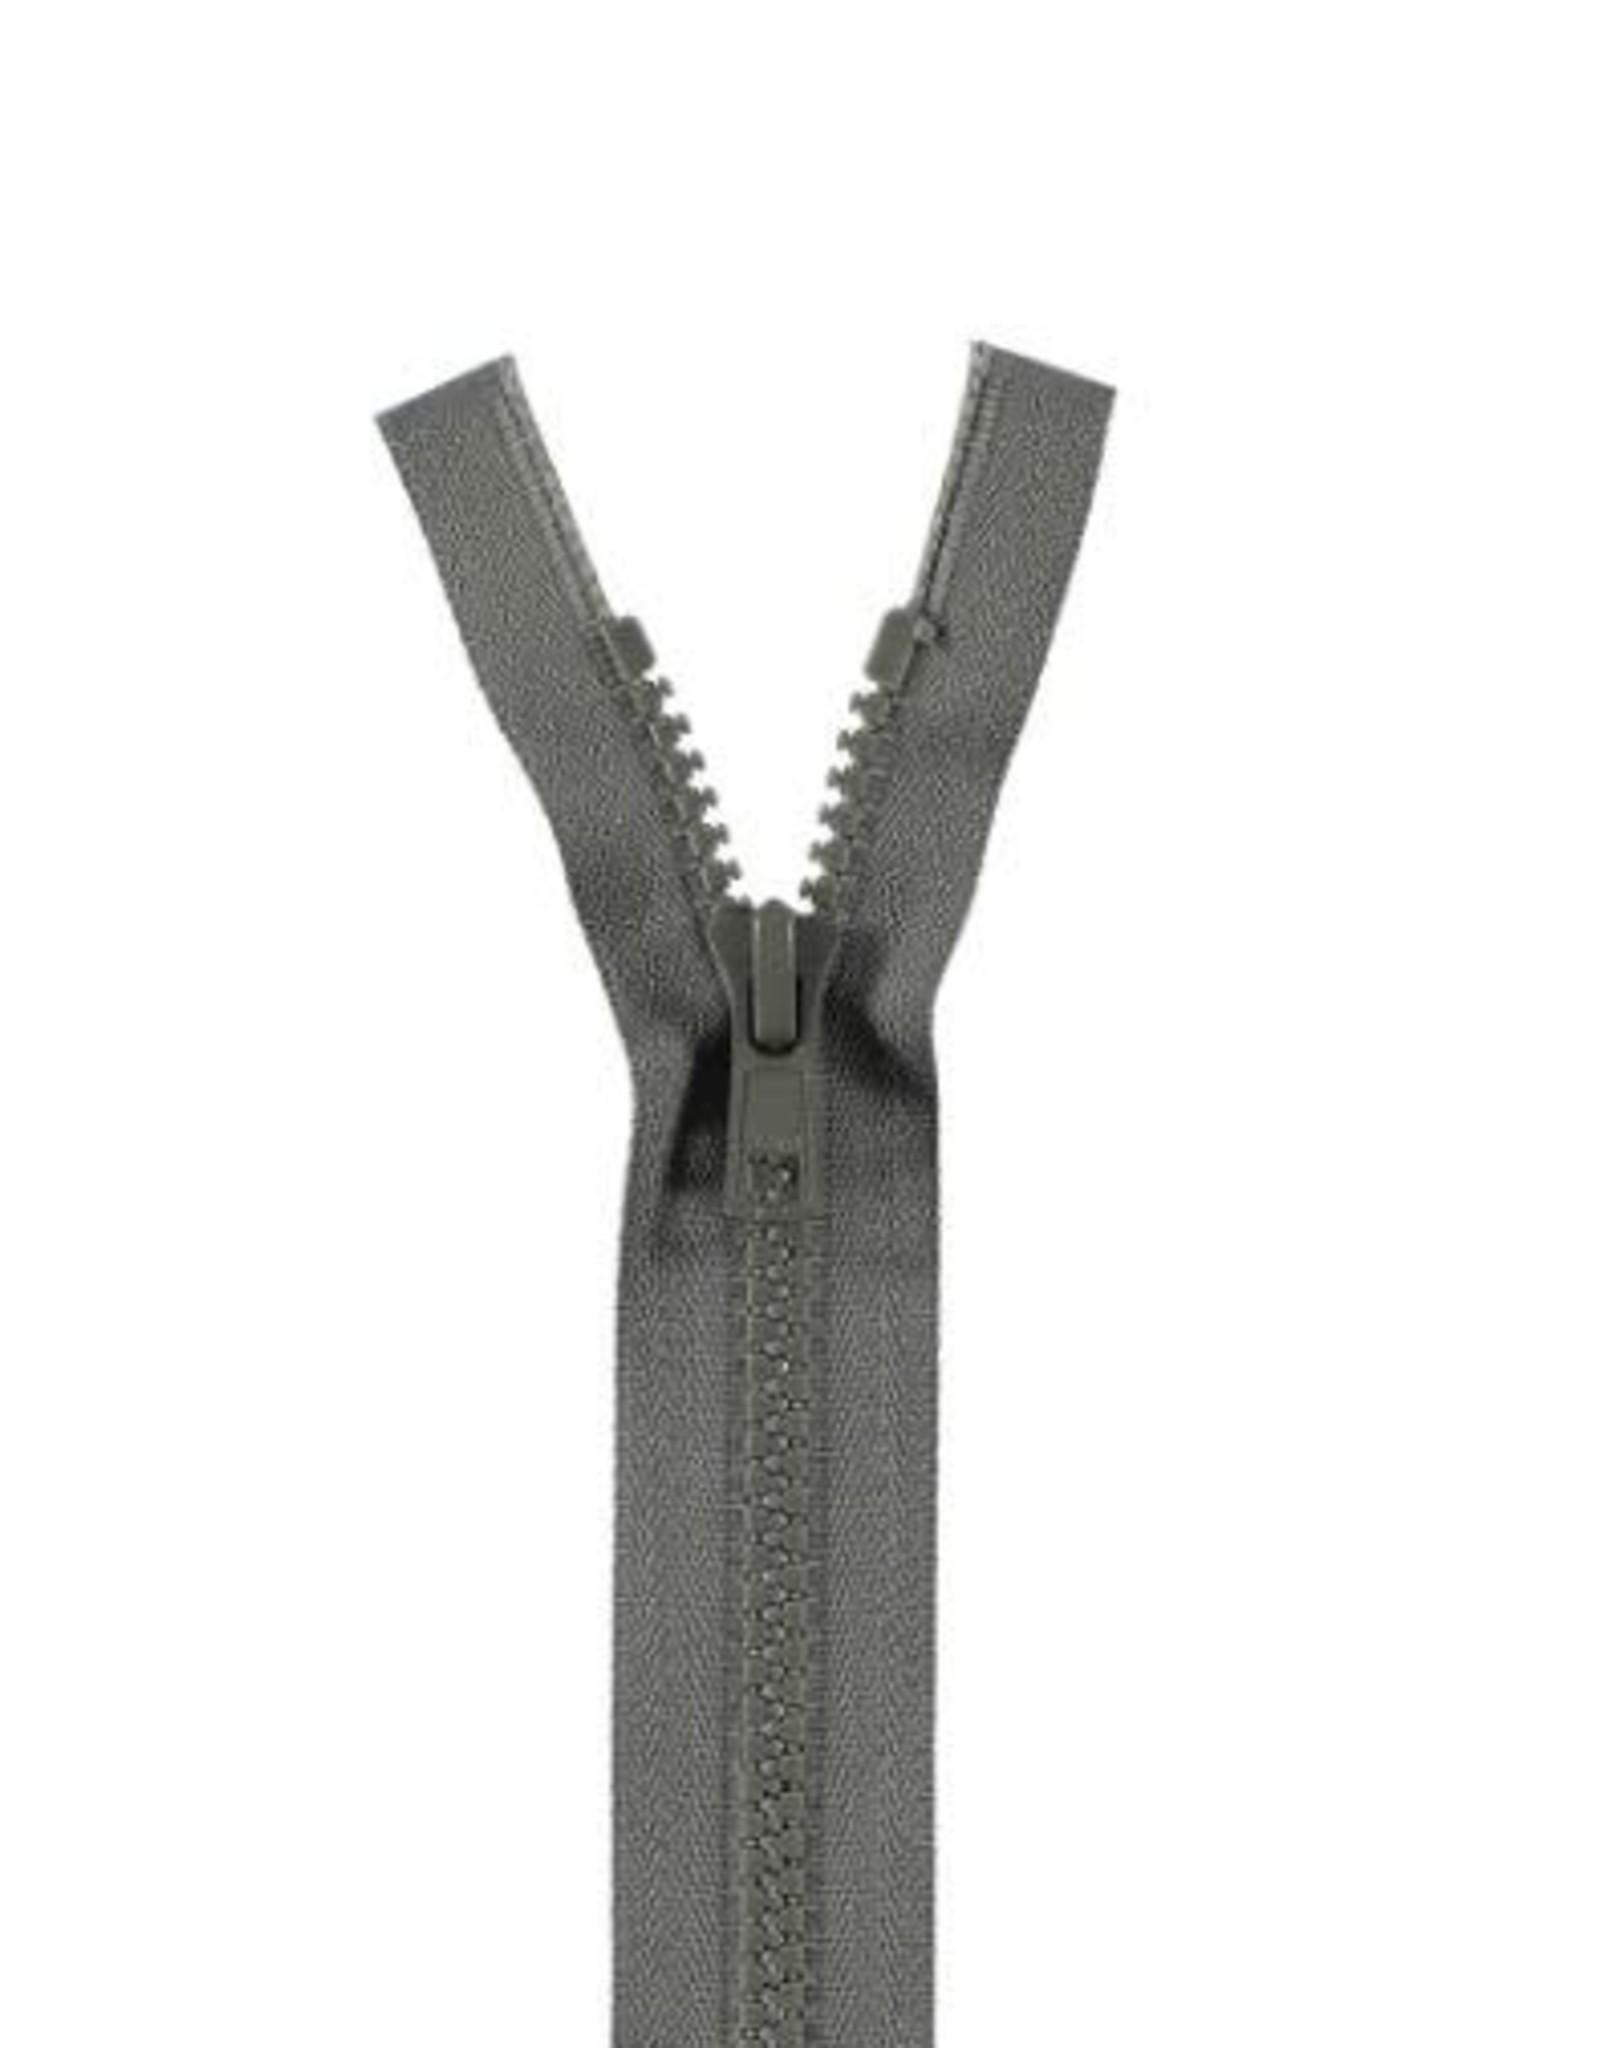 YKK BLOKRITS 5 DEELBAAR grijs 578-60cm